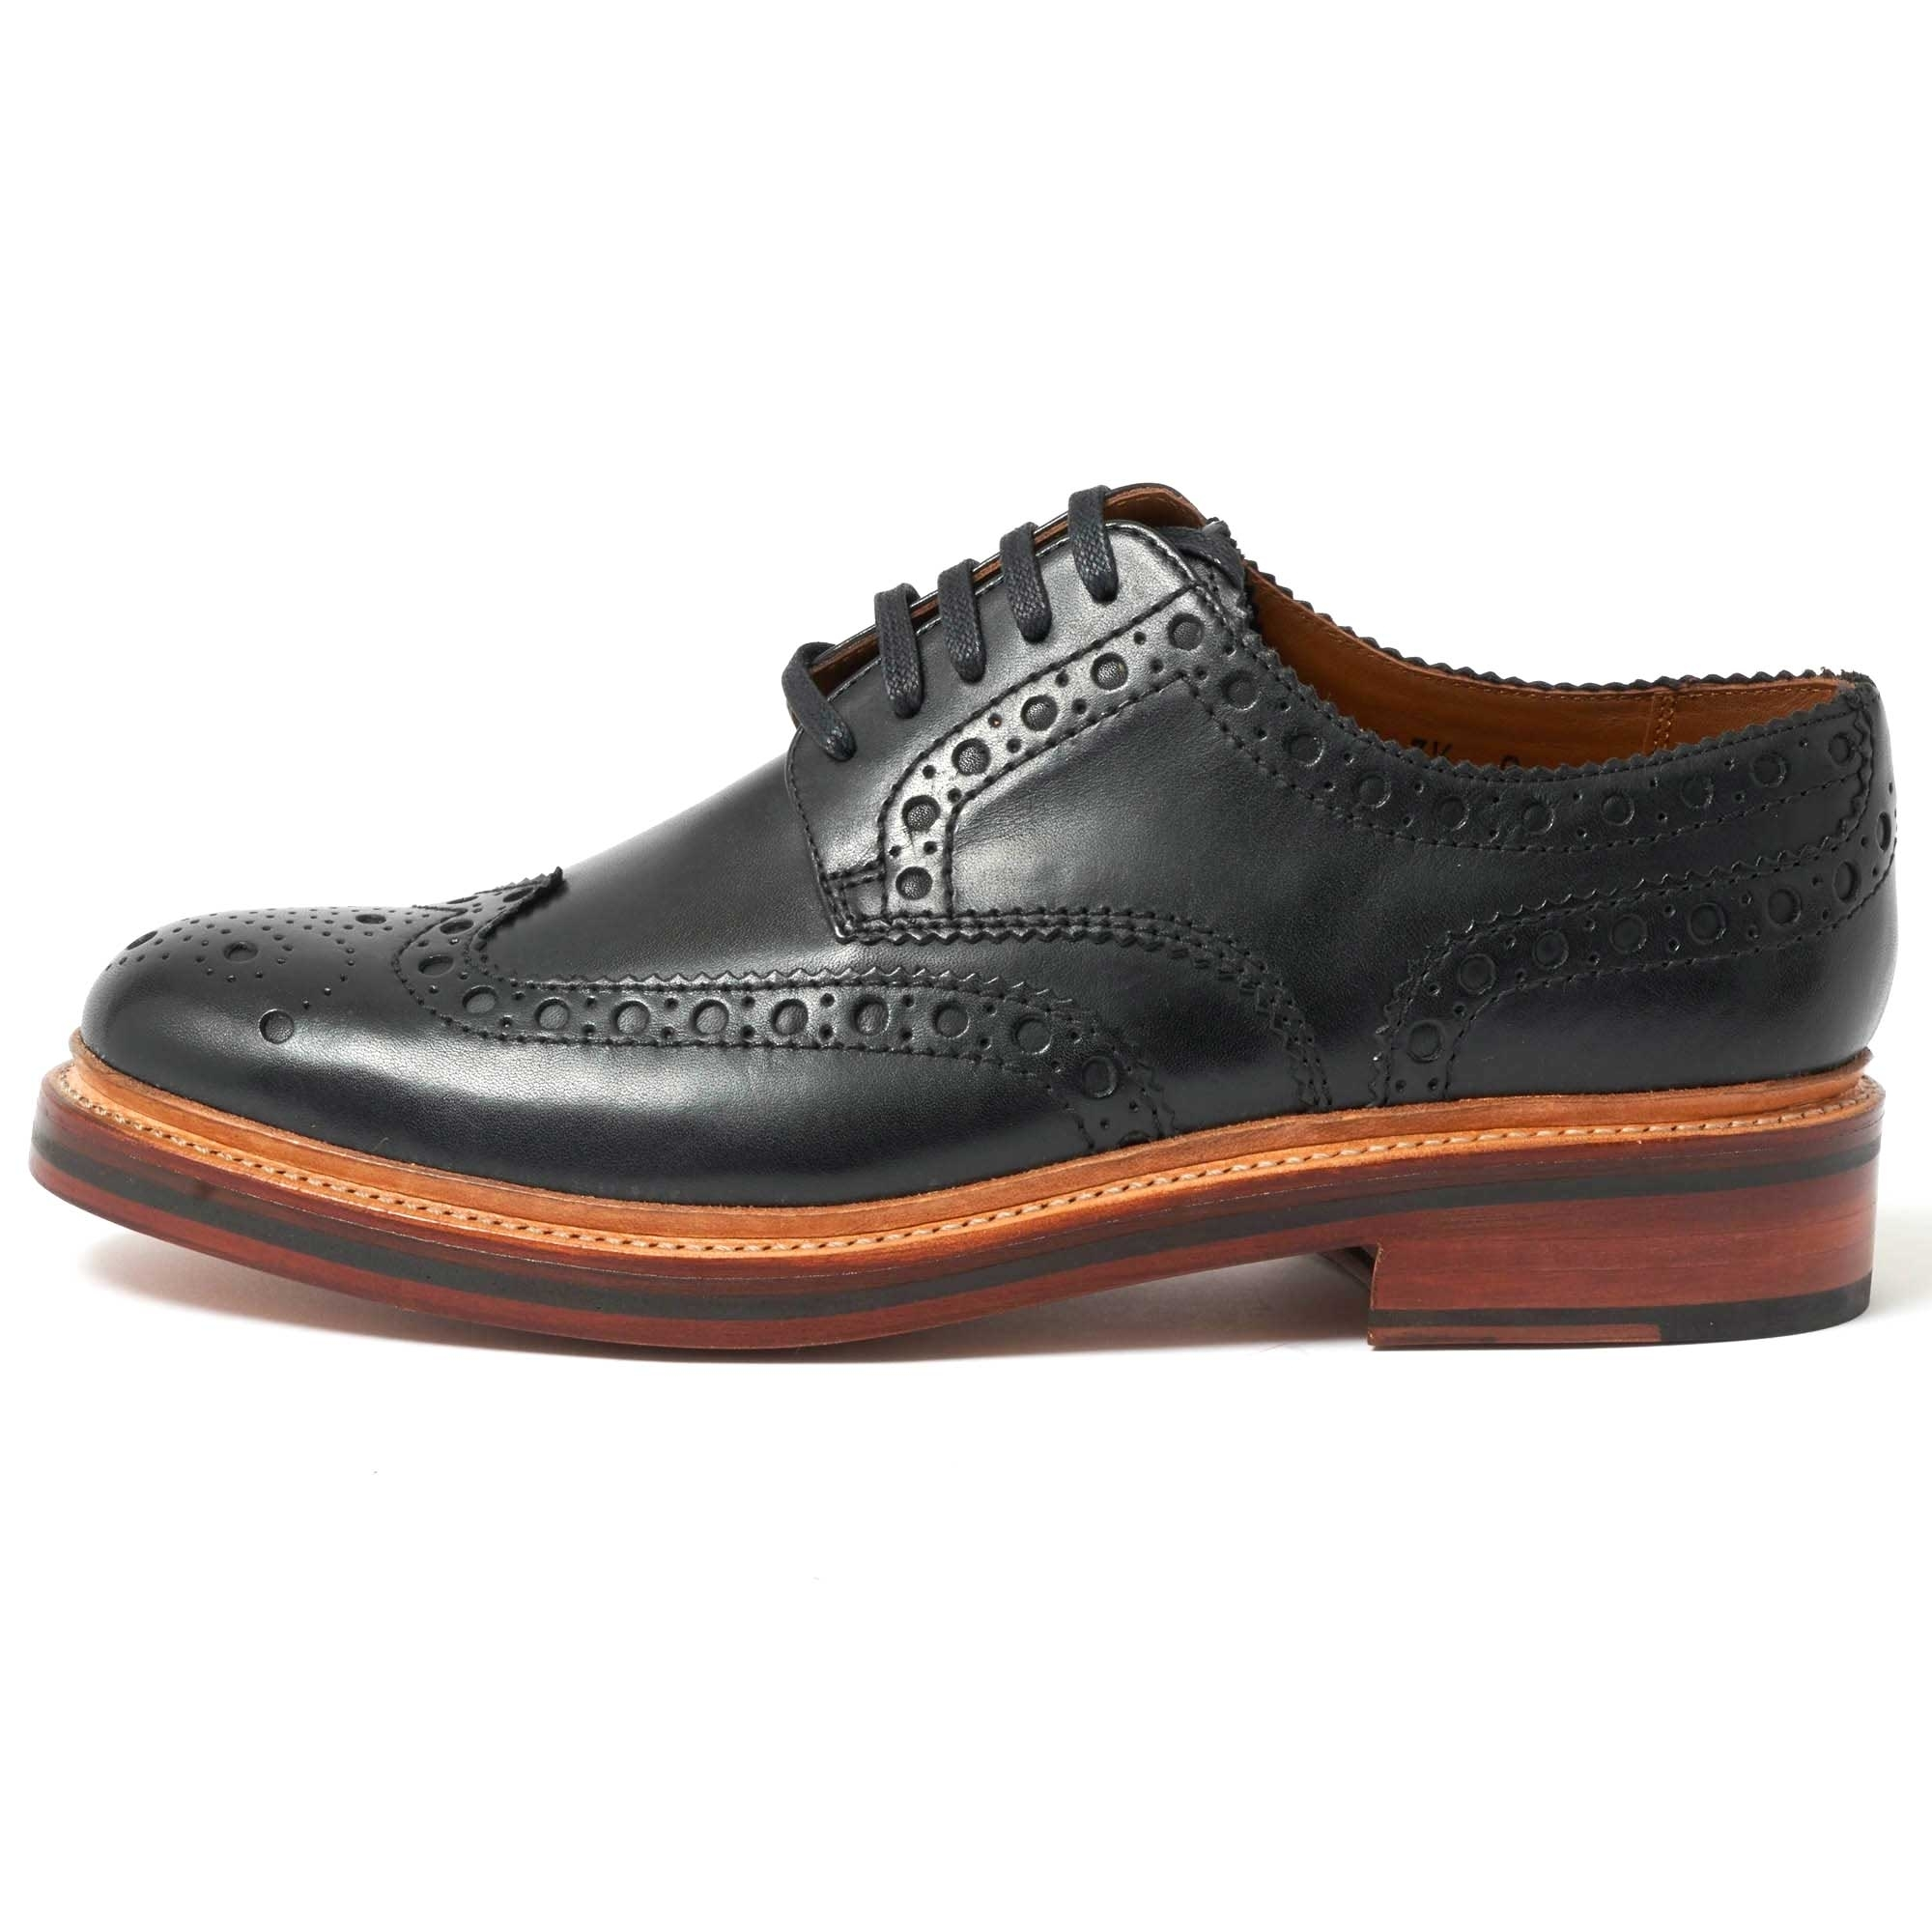 Grenson UK   Archie Black Brogue Shoes